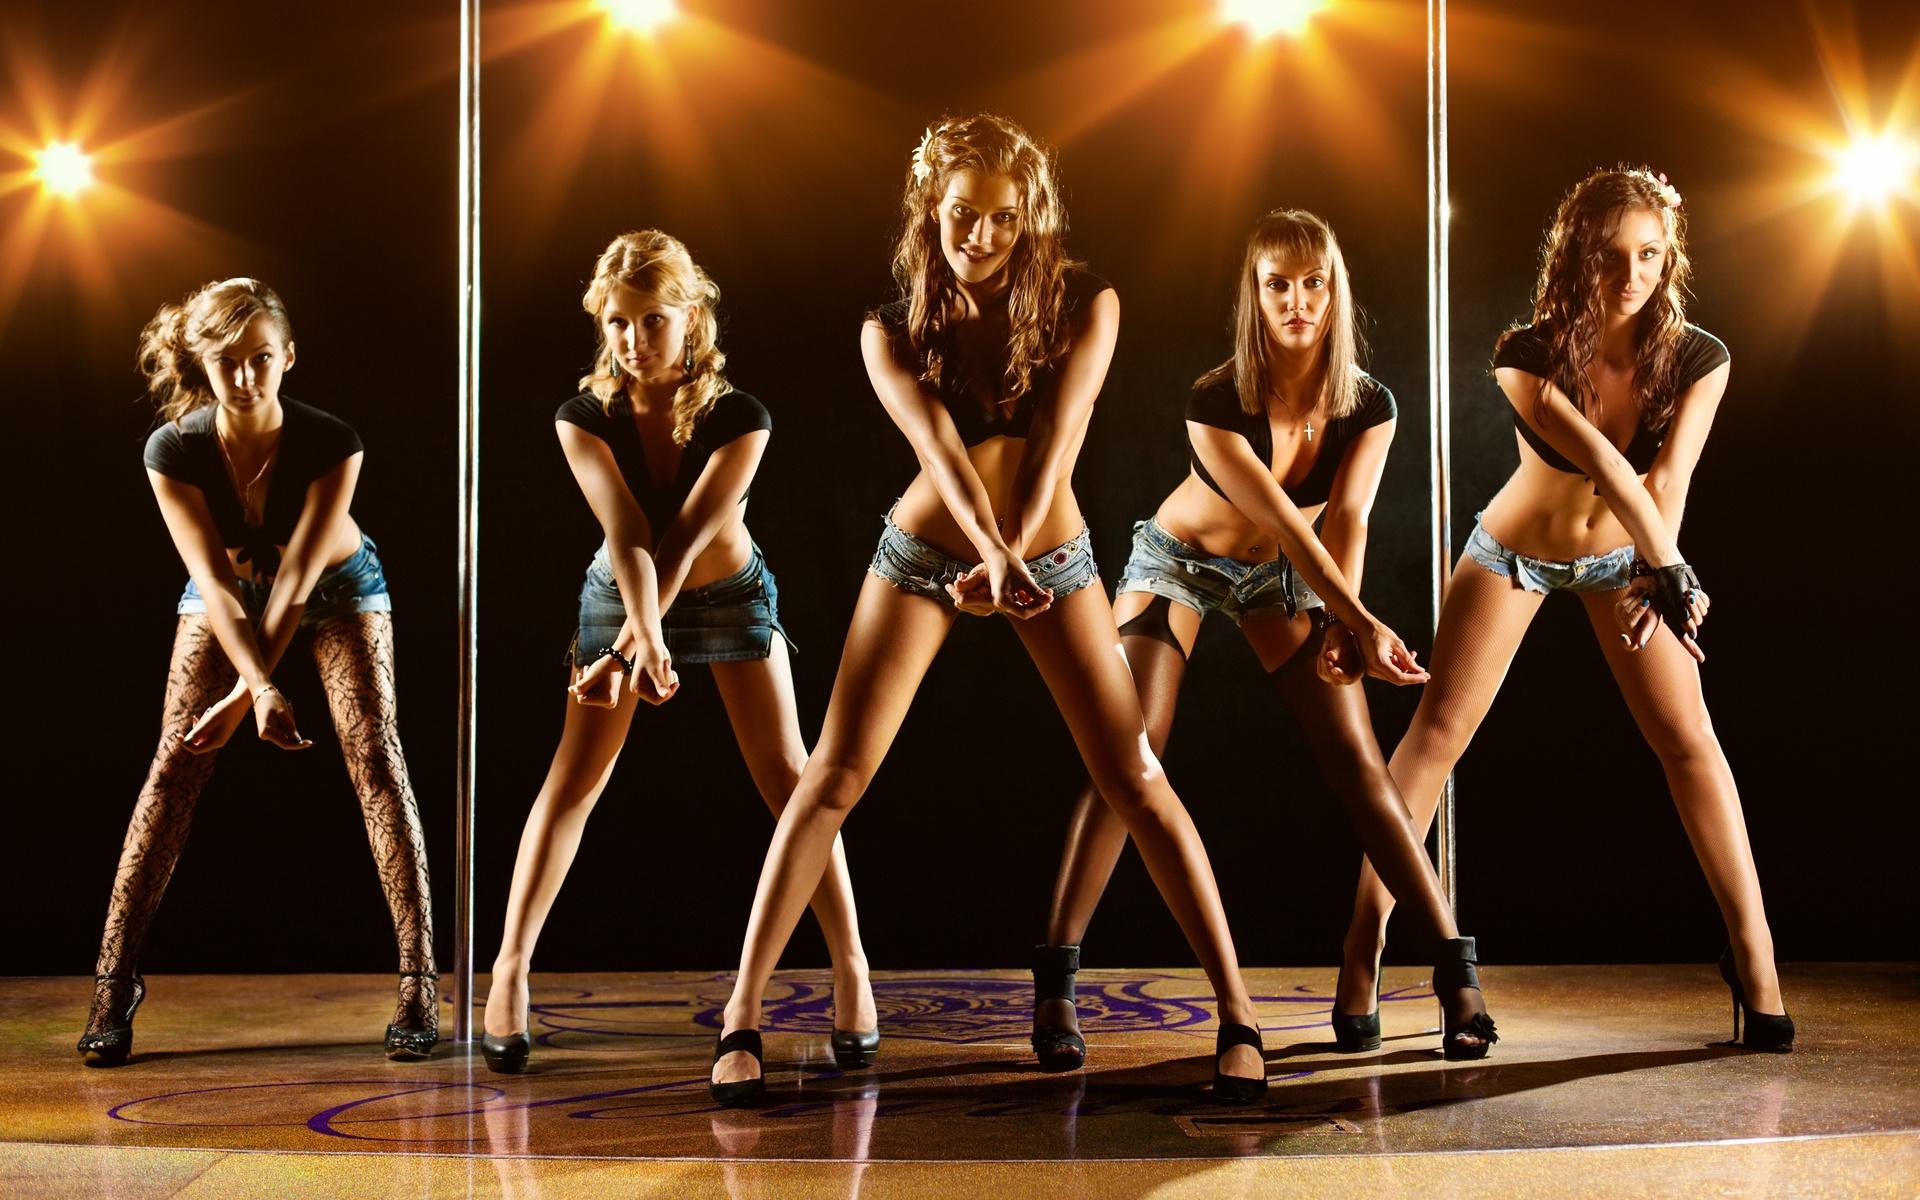 cute girls, dance, young, posing, modern, sexy, active, company, disco, silhouette, group, happiness, девушки, группа, группа девушек